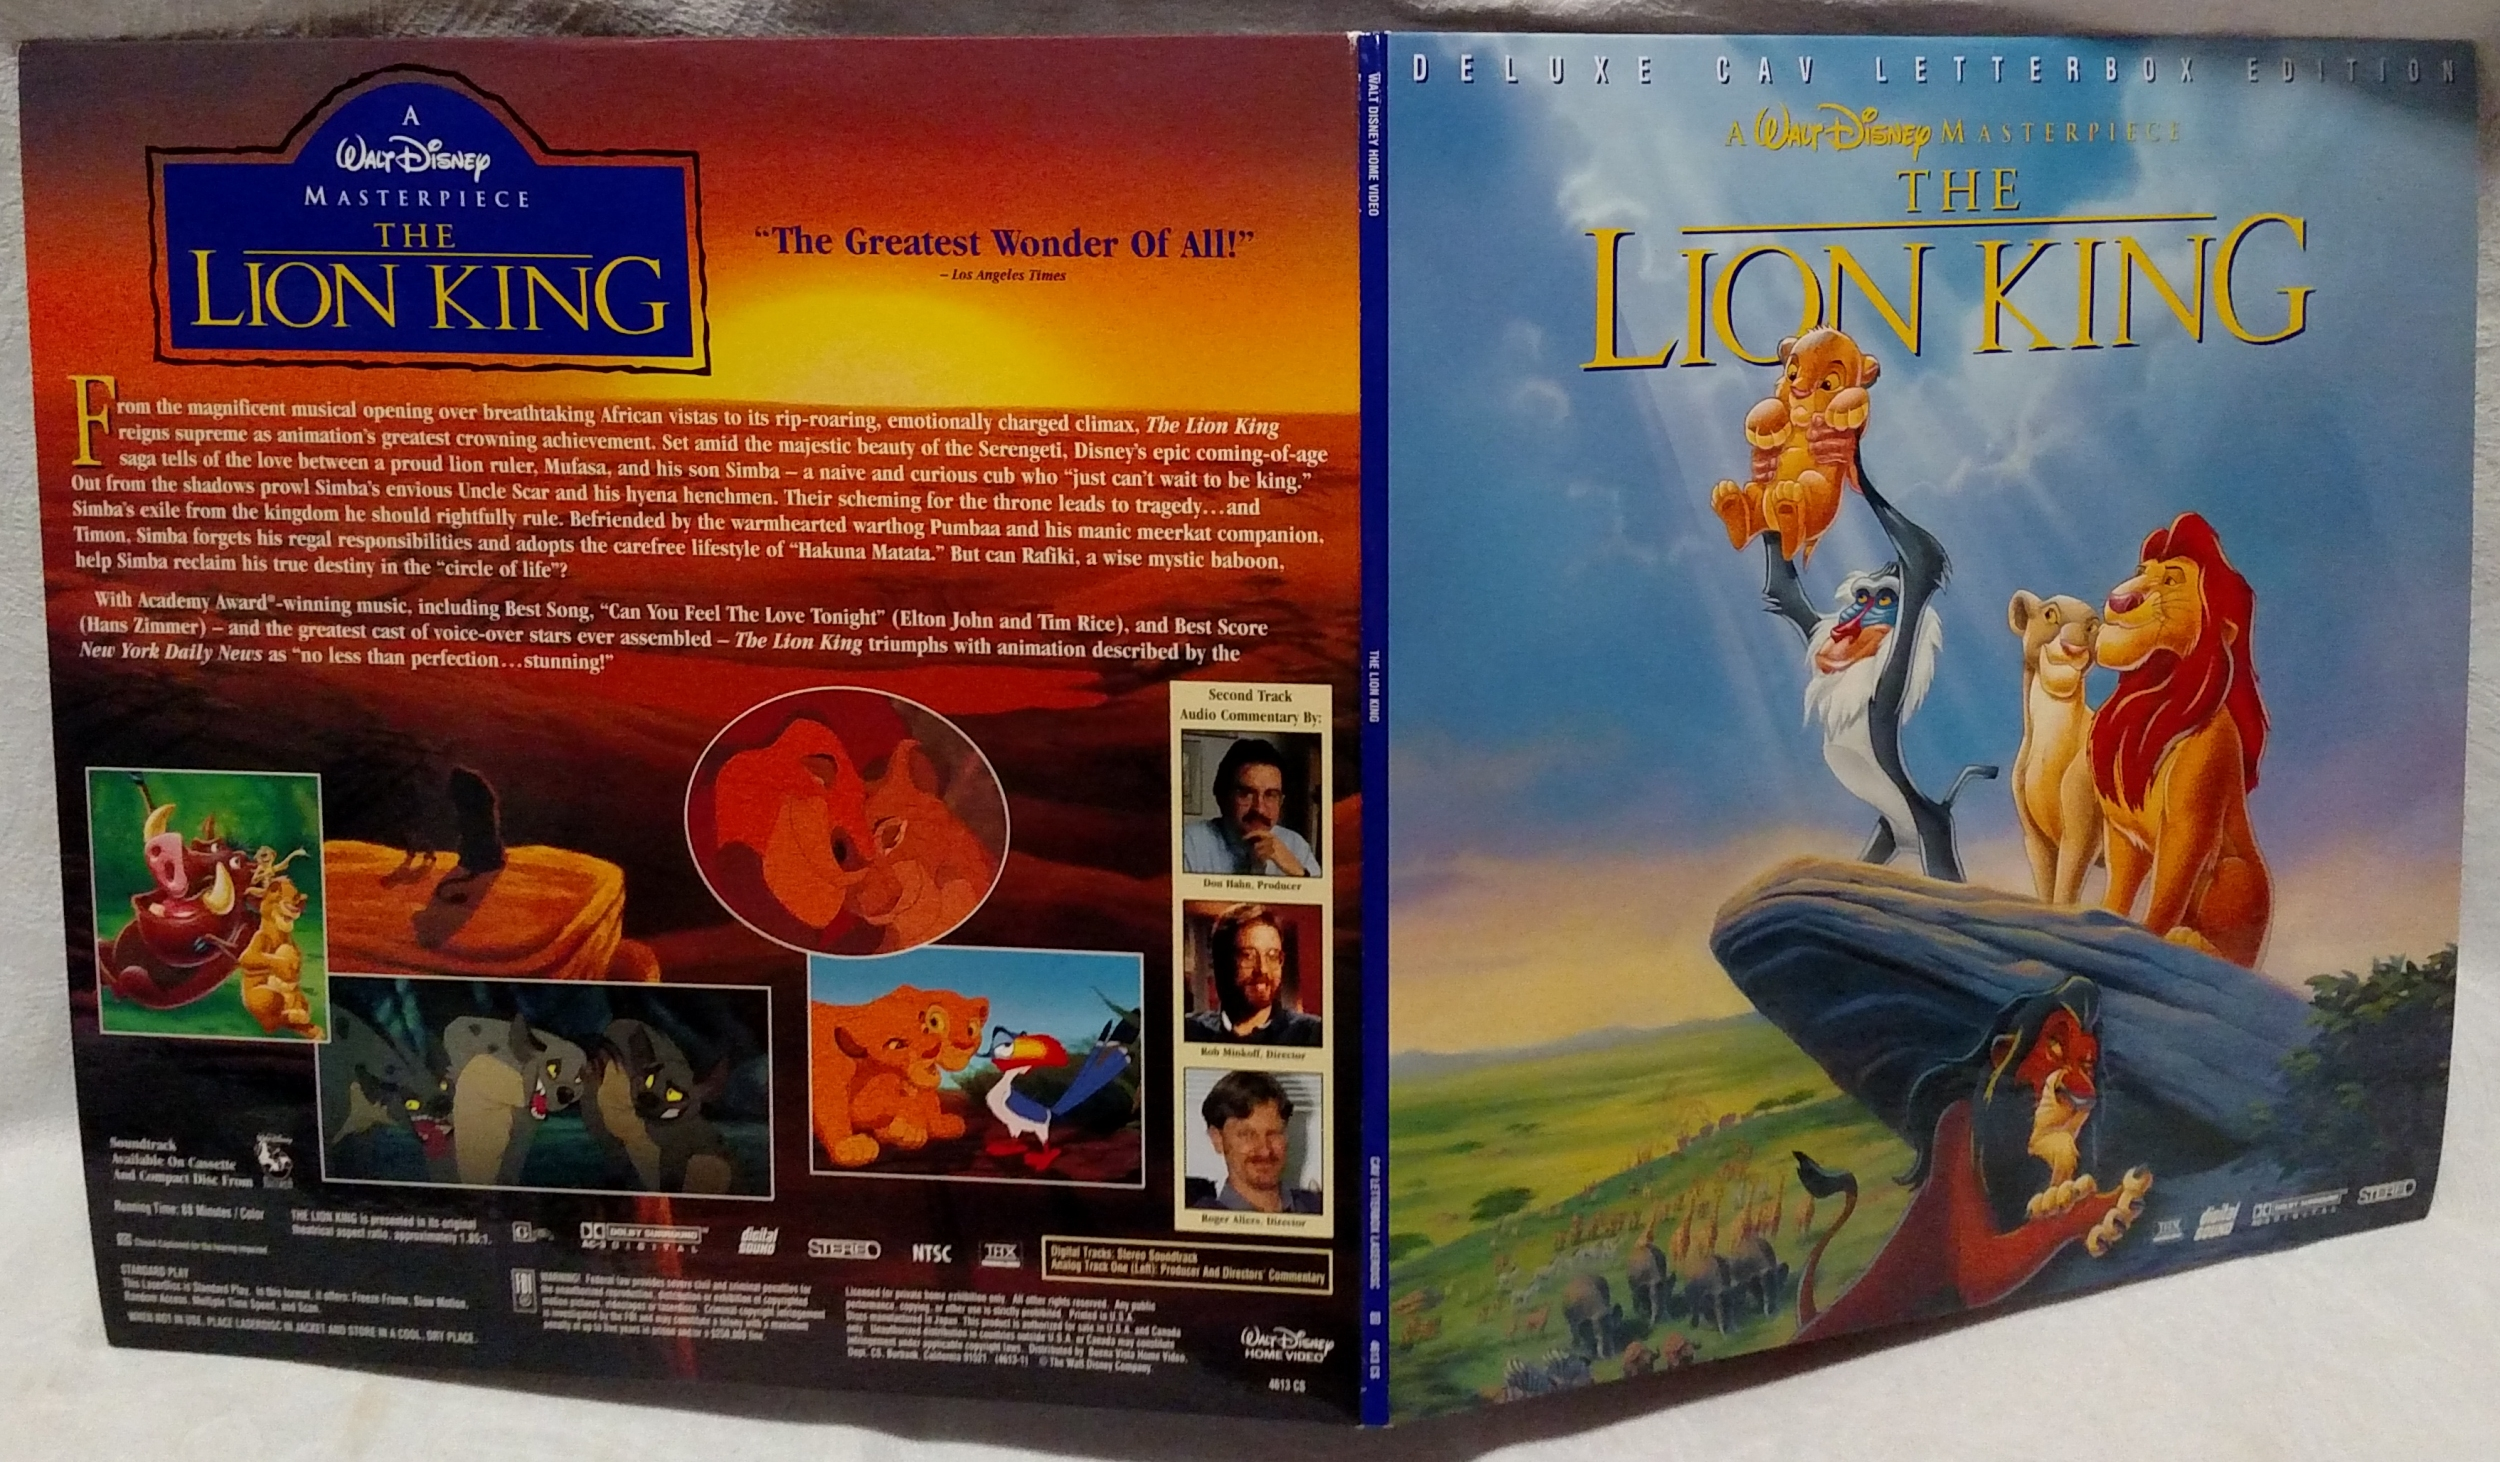 The Lion King Laserdisc - Movie Gatefold Front & Rear